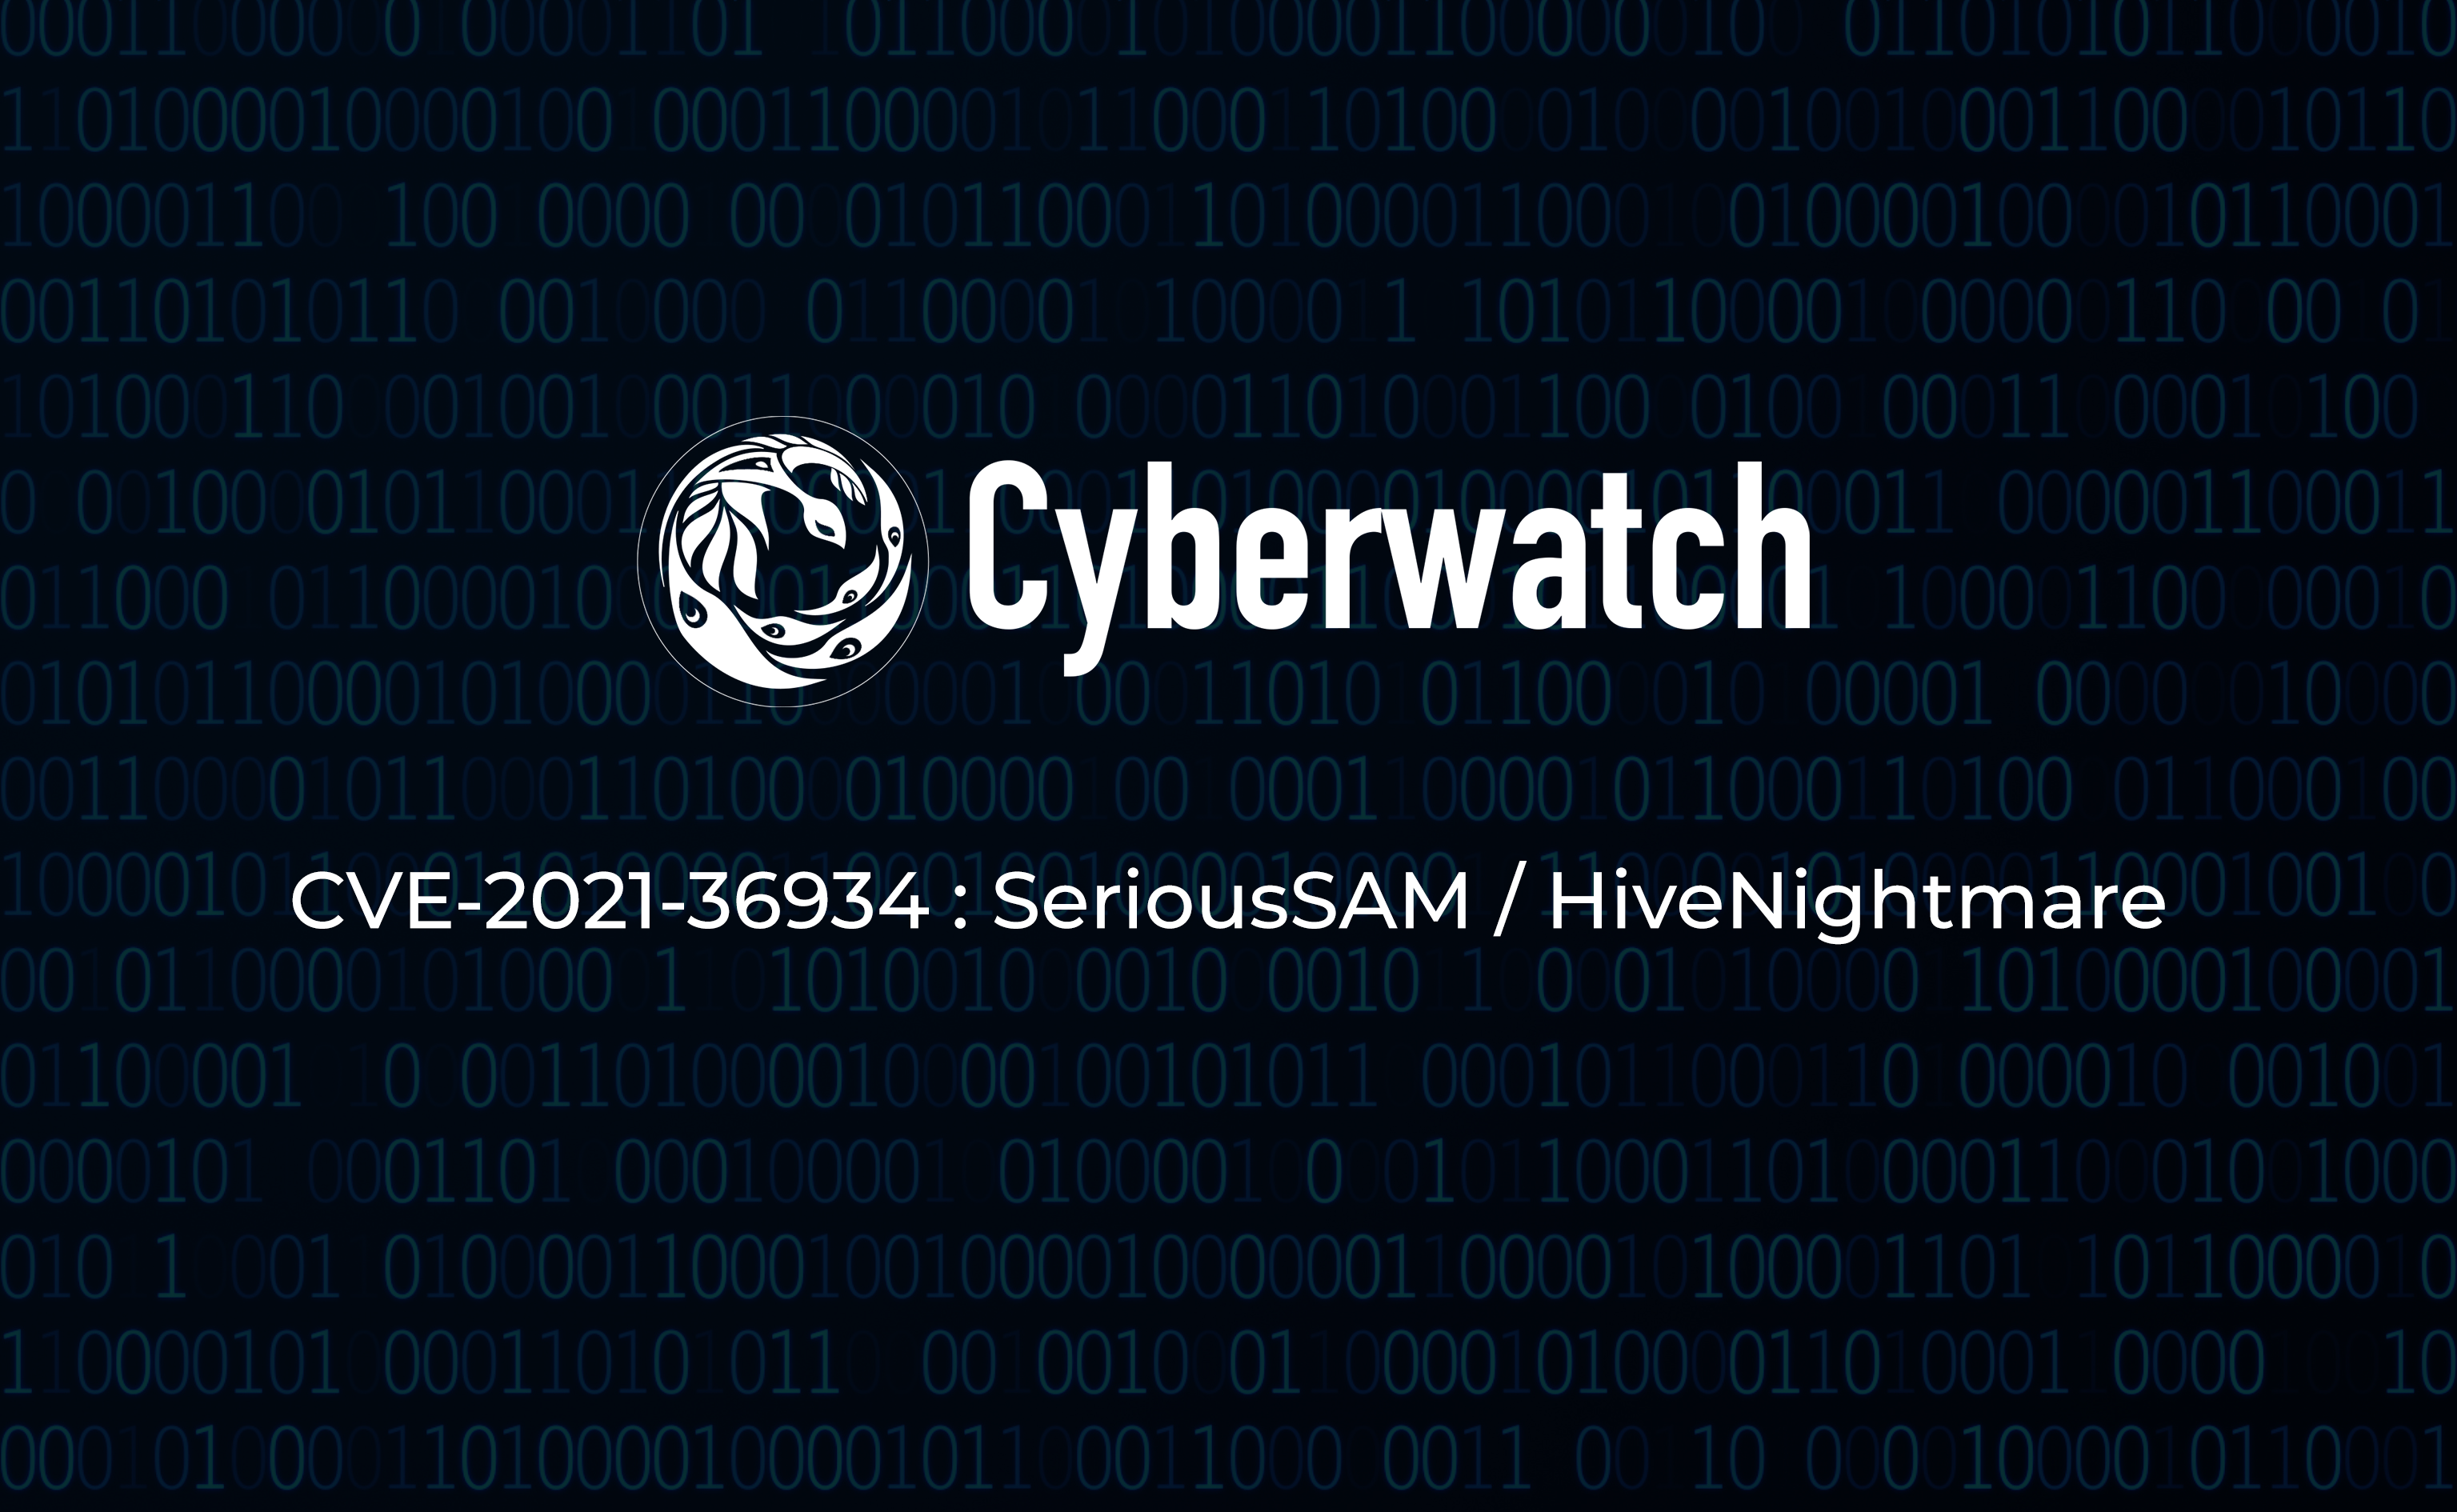 CVE-2021-36934 SeriousSAM HiveNightmare